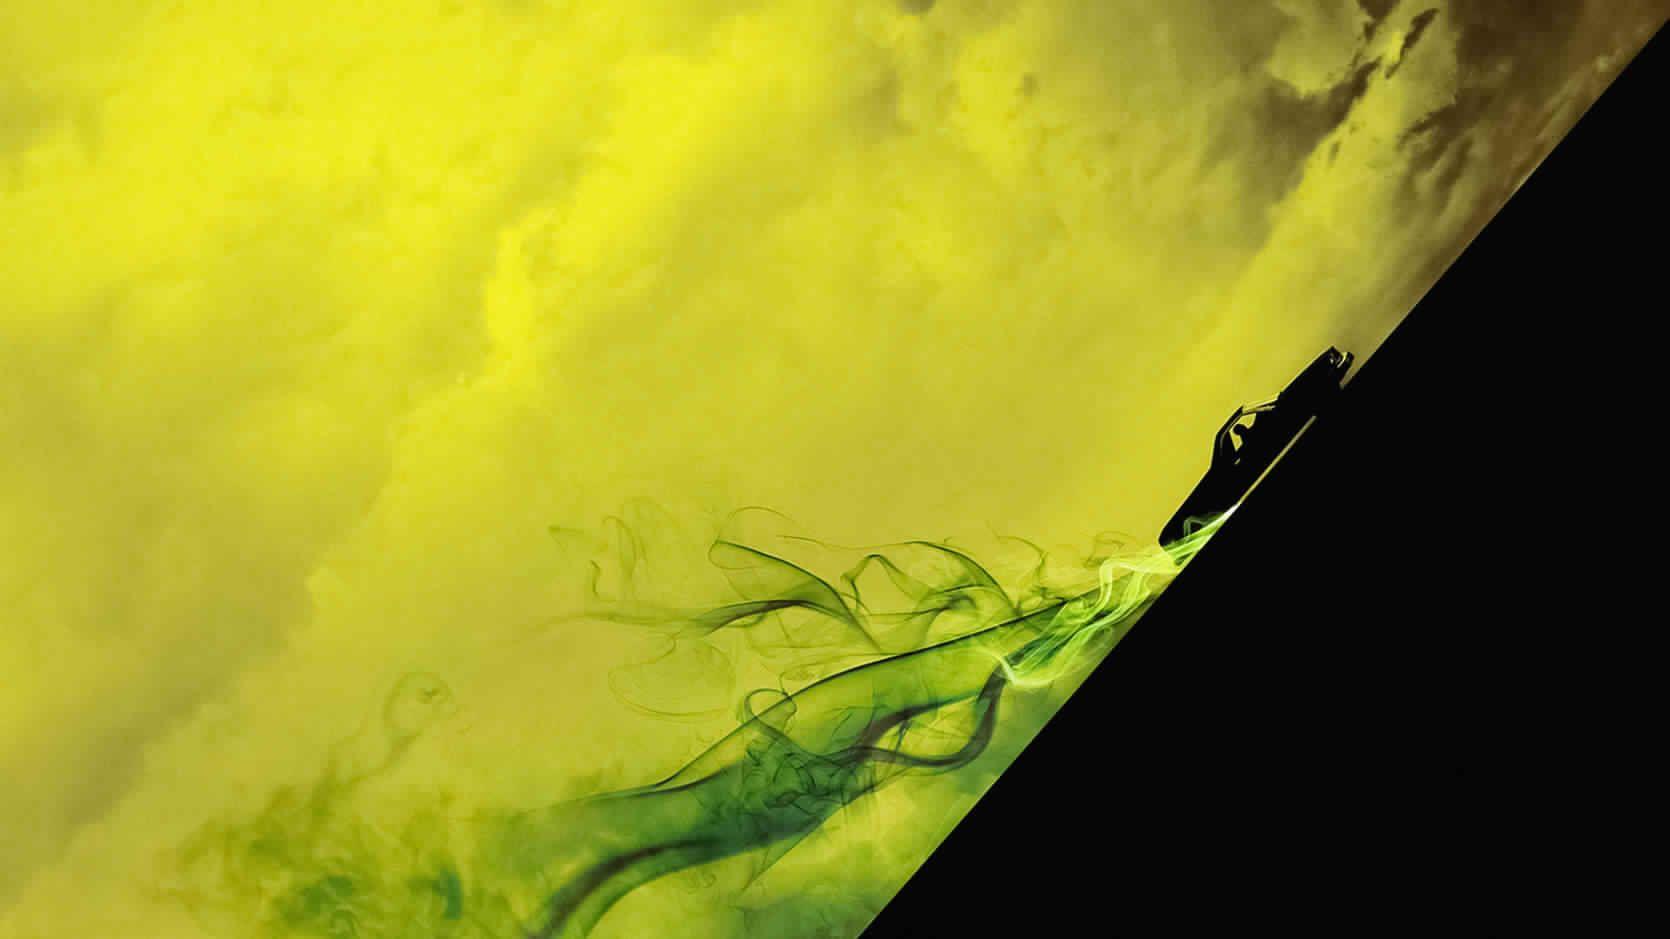 El Camino Breaking Bad Movie Wallpaper Jesse Pinkman Hd 4k 1080p Breaking Bad Breaking Bad Movie Worst Movies